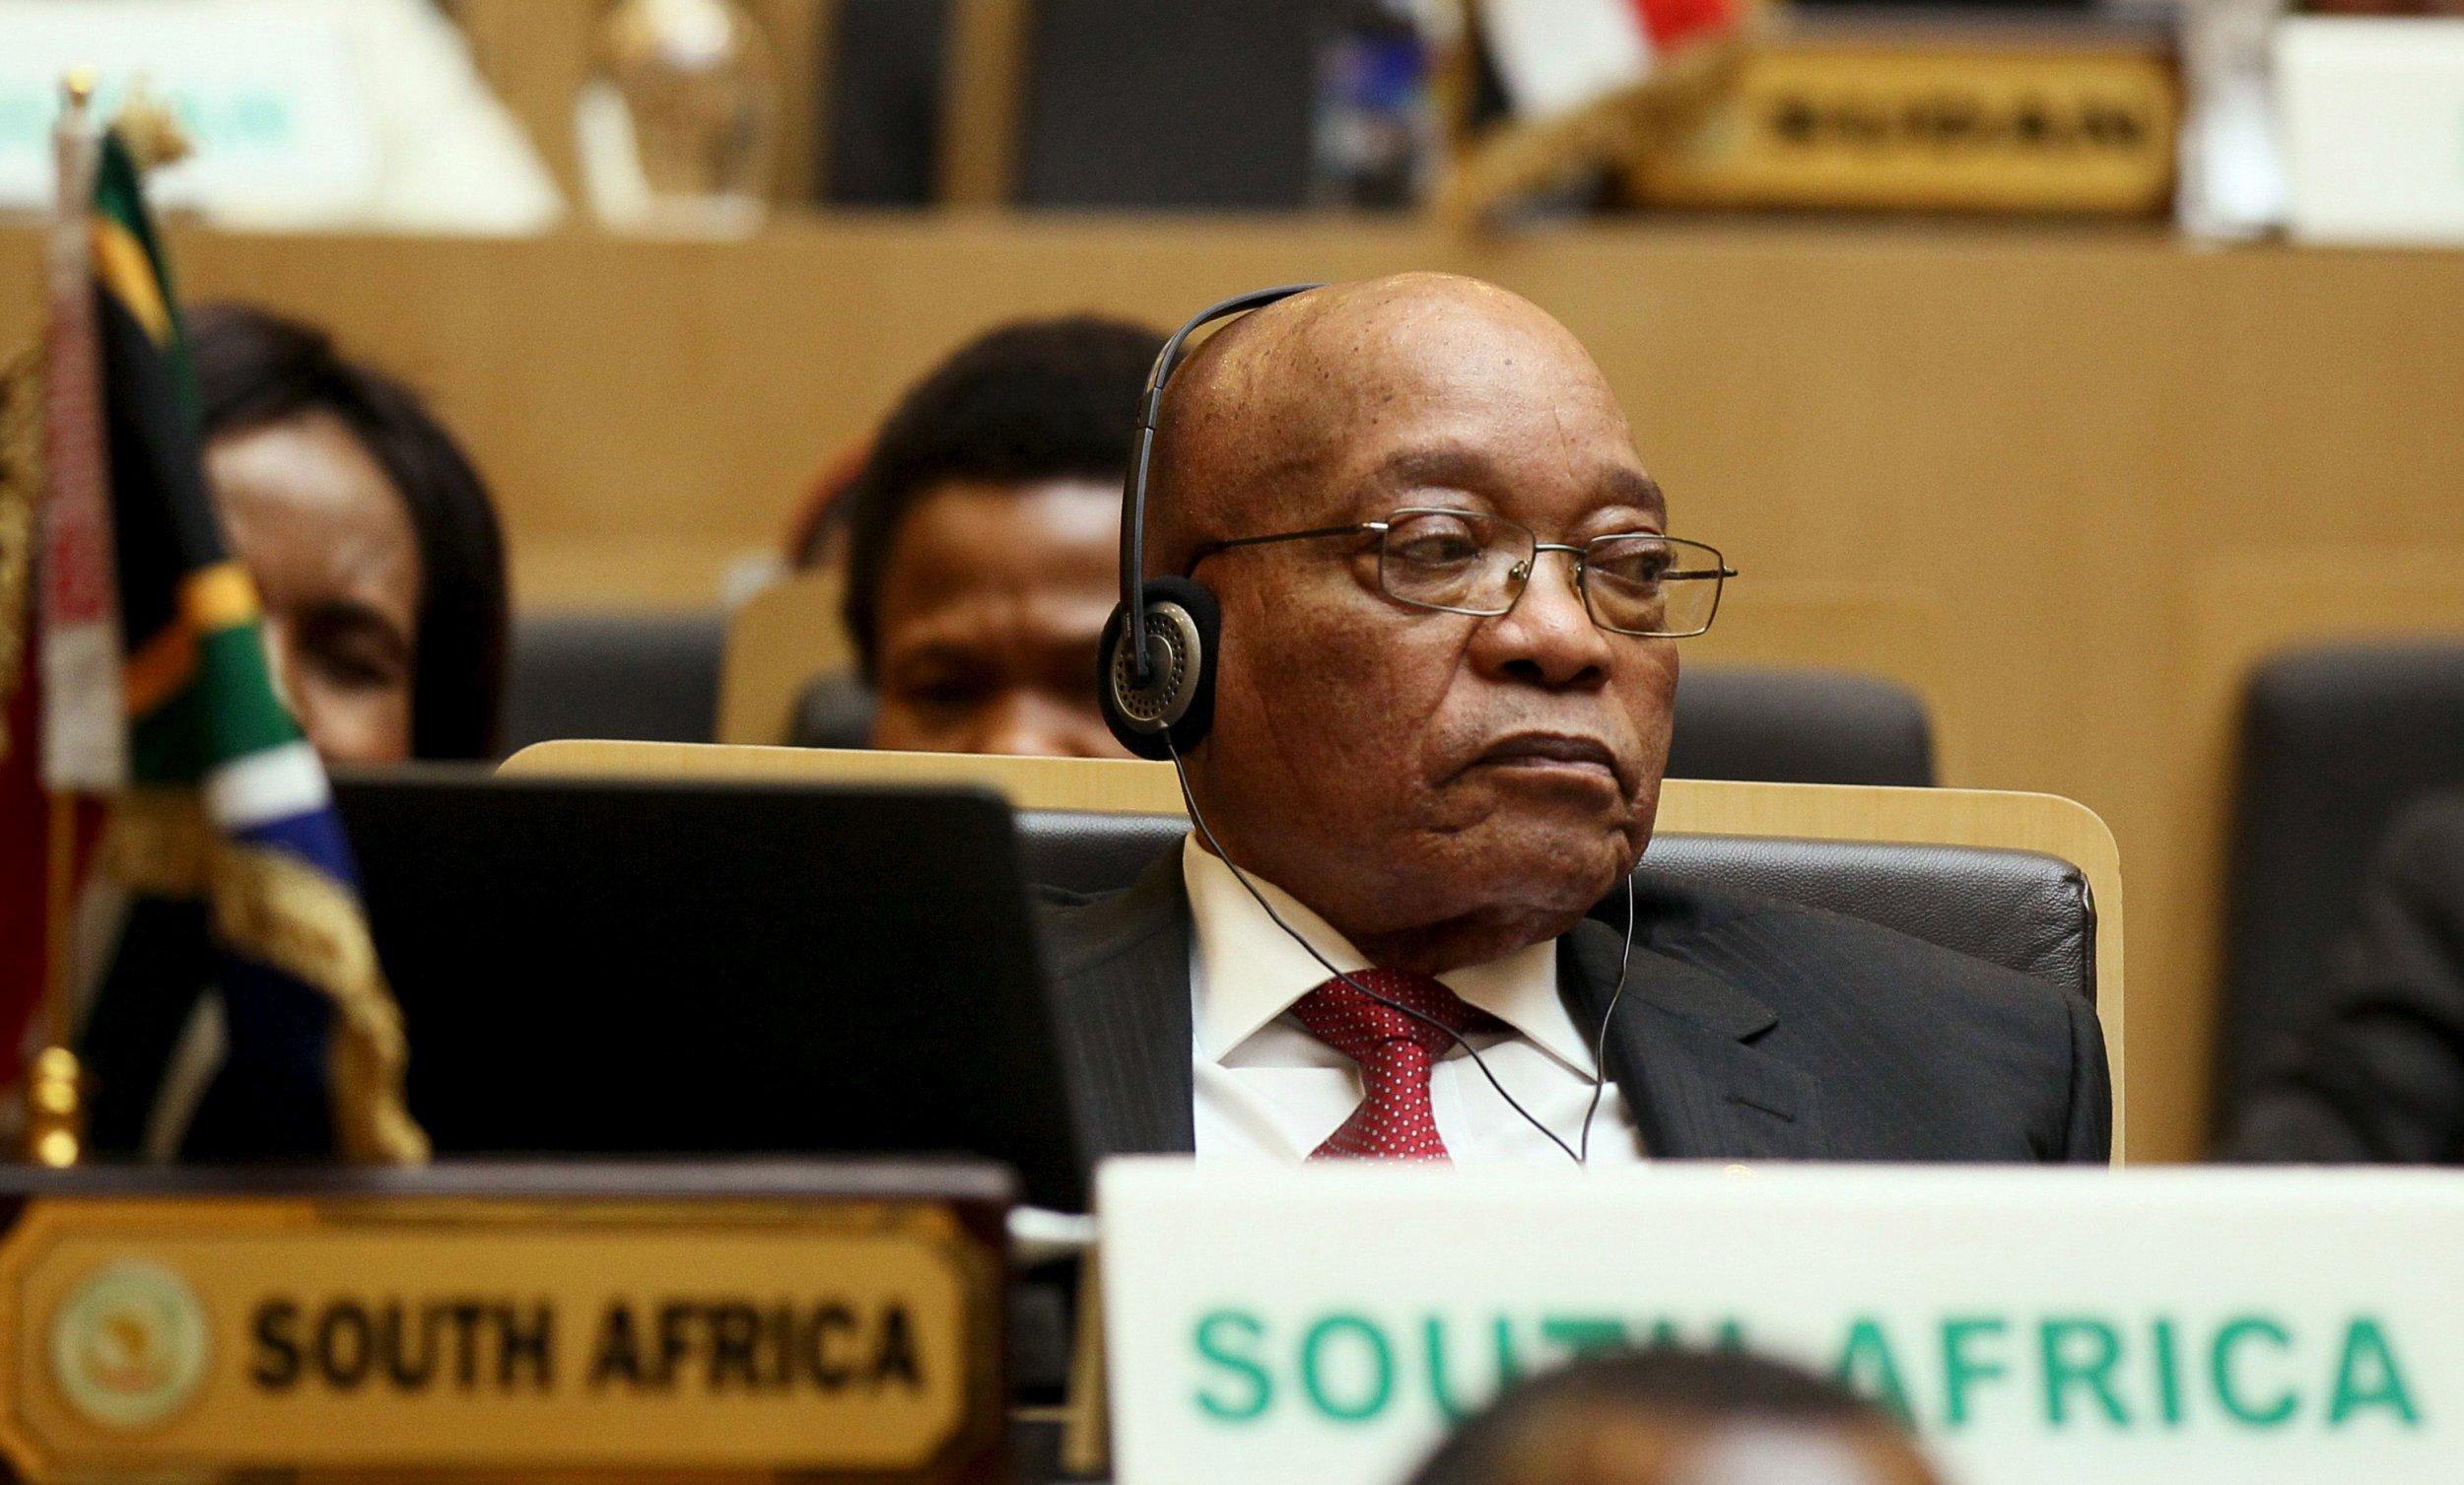 Jacob Zuma is facing calls to pay back the Nkandla money.